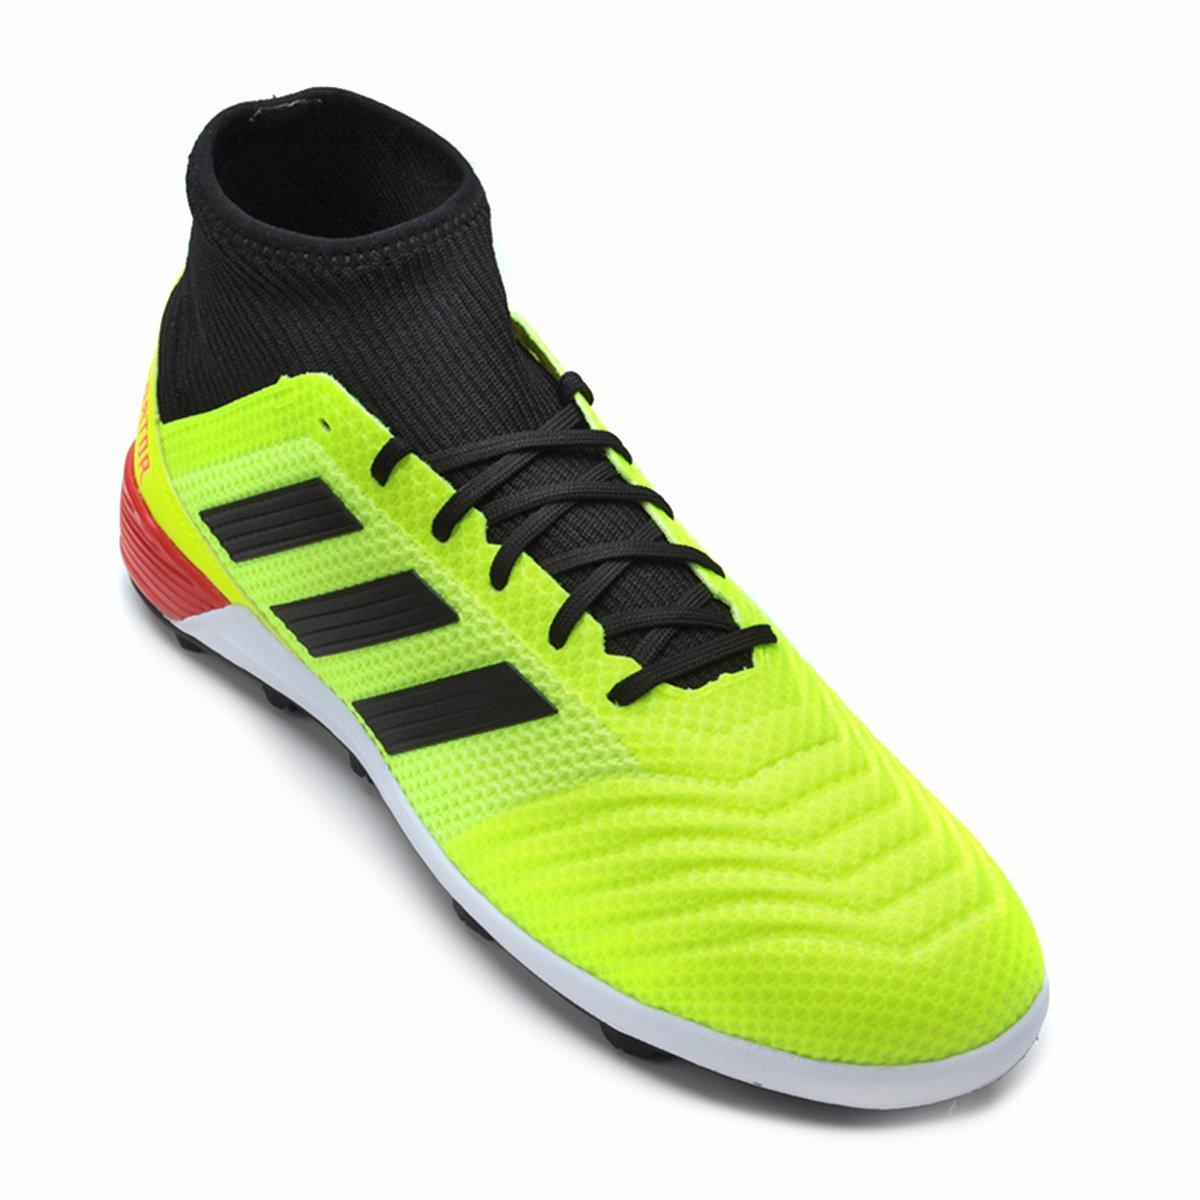 5b4cc69c30 Chuteira Society Adidas Predator TAN 18 3 TF